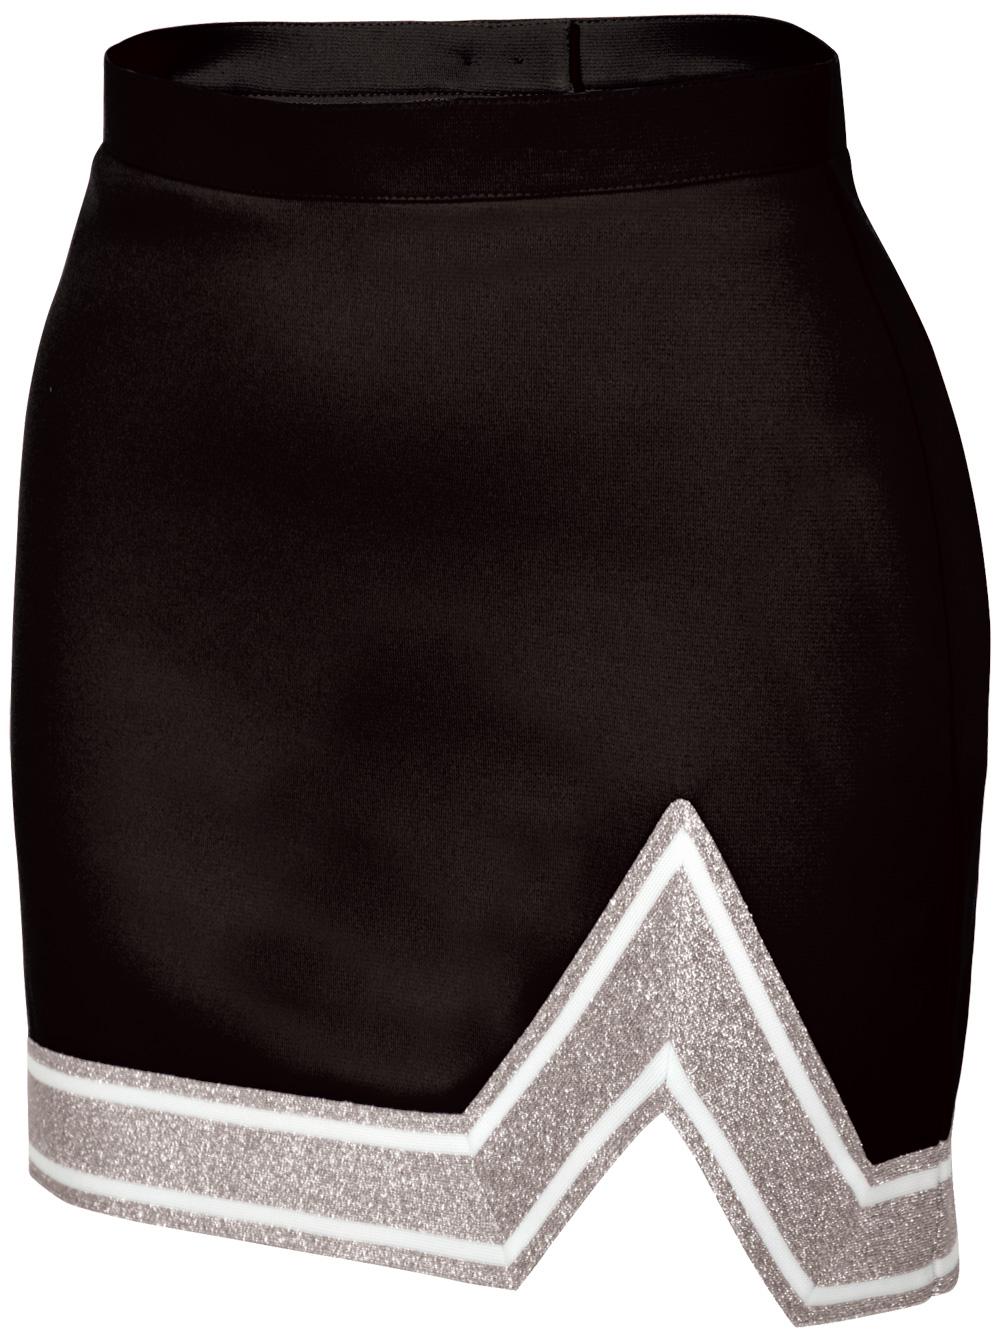 Chasse Girls' Blaze Skirt Black/White/Metallic Silver Youth Small Size - Small